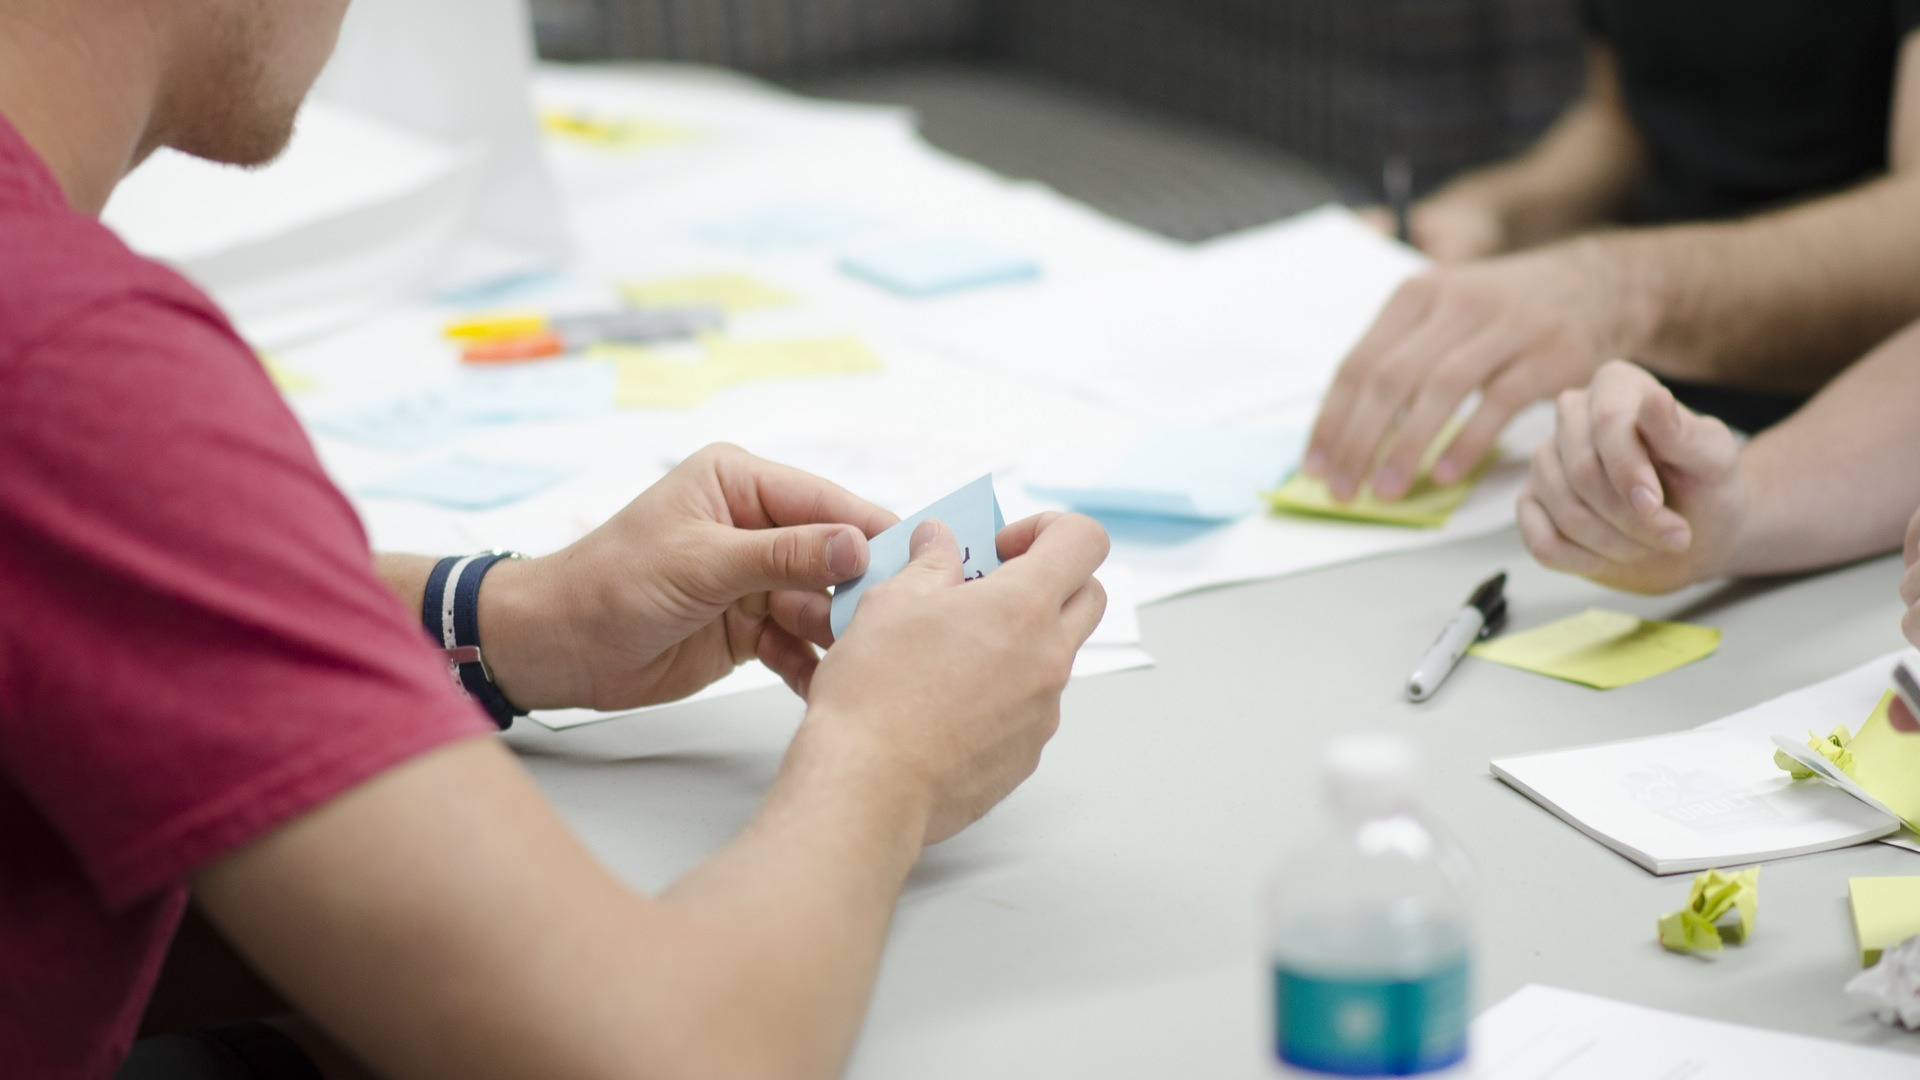 5 Collaborative Brainstorming Secrets